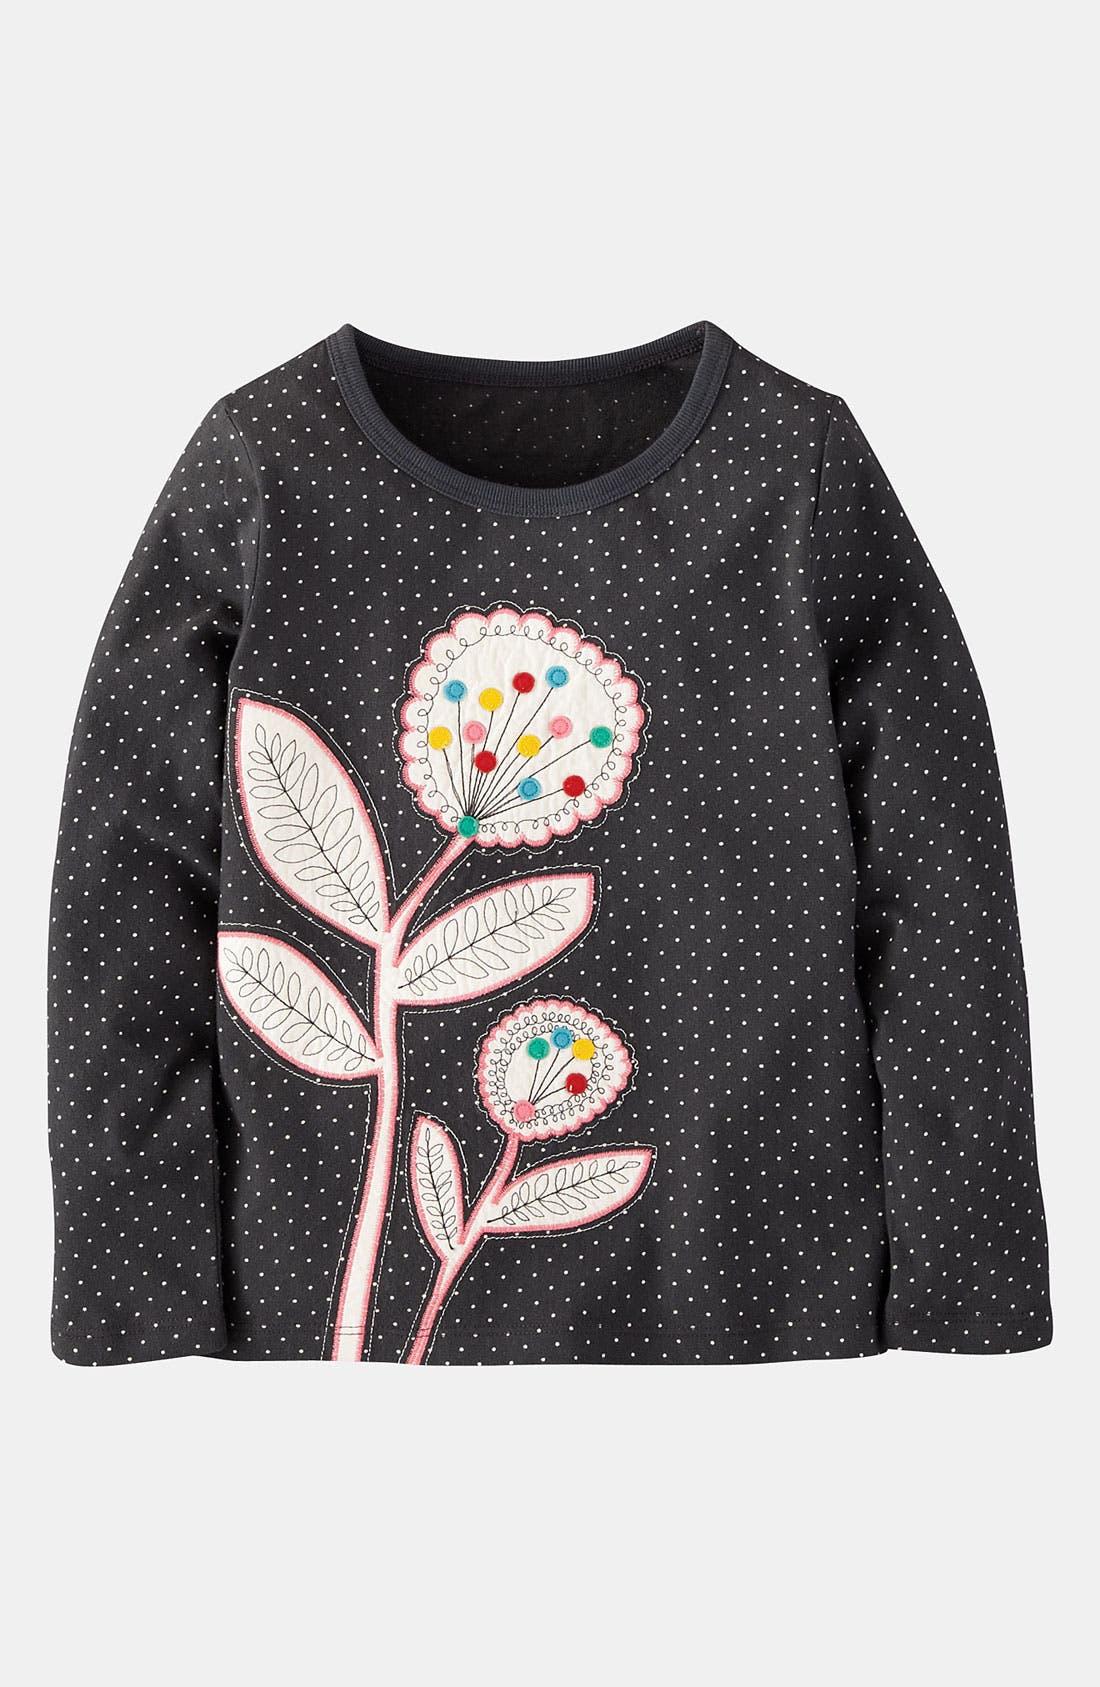 Alternate Image 1 Selected - Mini Boden 'Nordic Appliqué' Tee (Toddler, Little Girls & Big Girls)